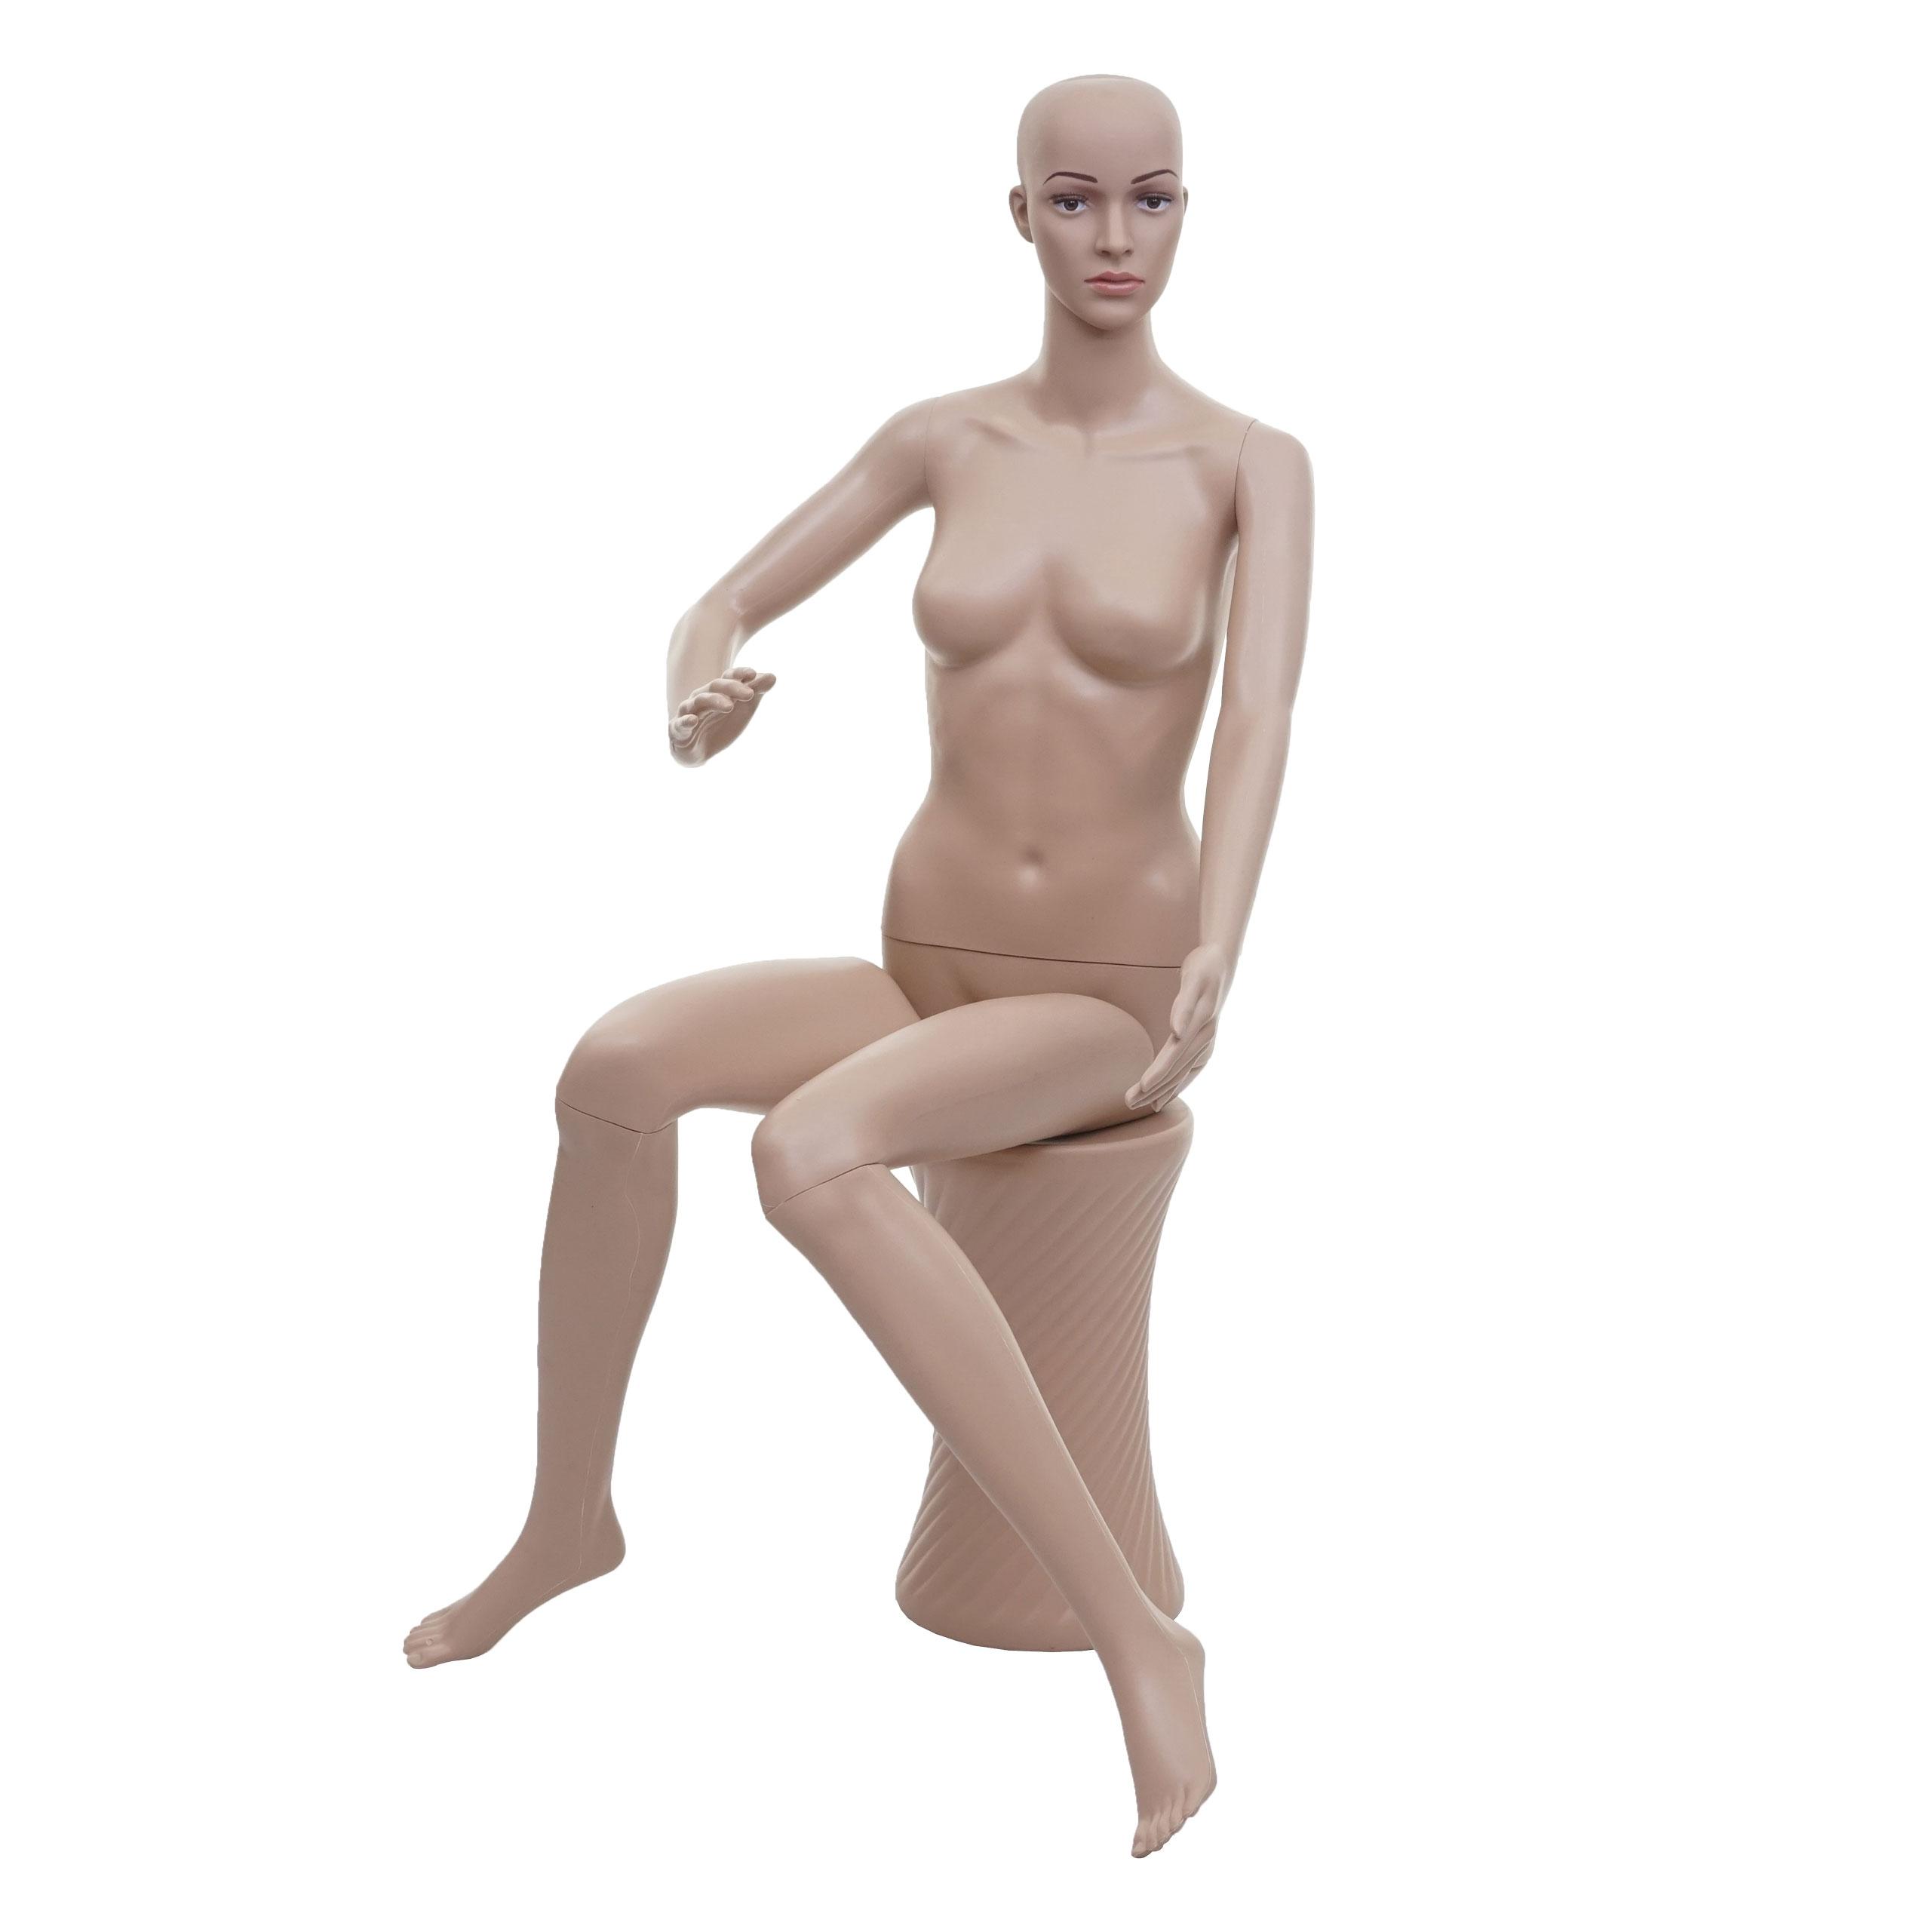 Mendler Schaufensterpuppe HWC-E37, weiblich Frau Schaufensterfigur Puppe Mannequin Schneiderpuppe, sitzend l 75708